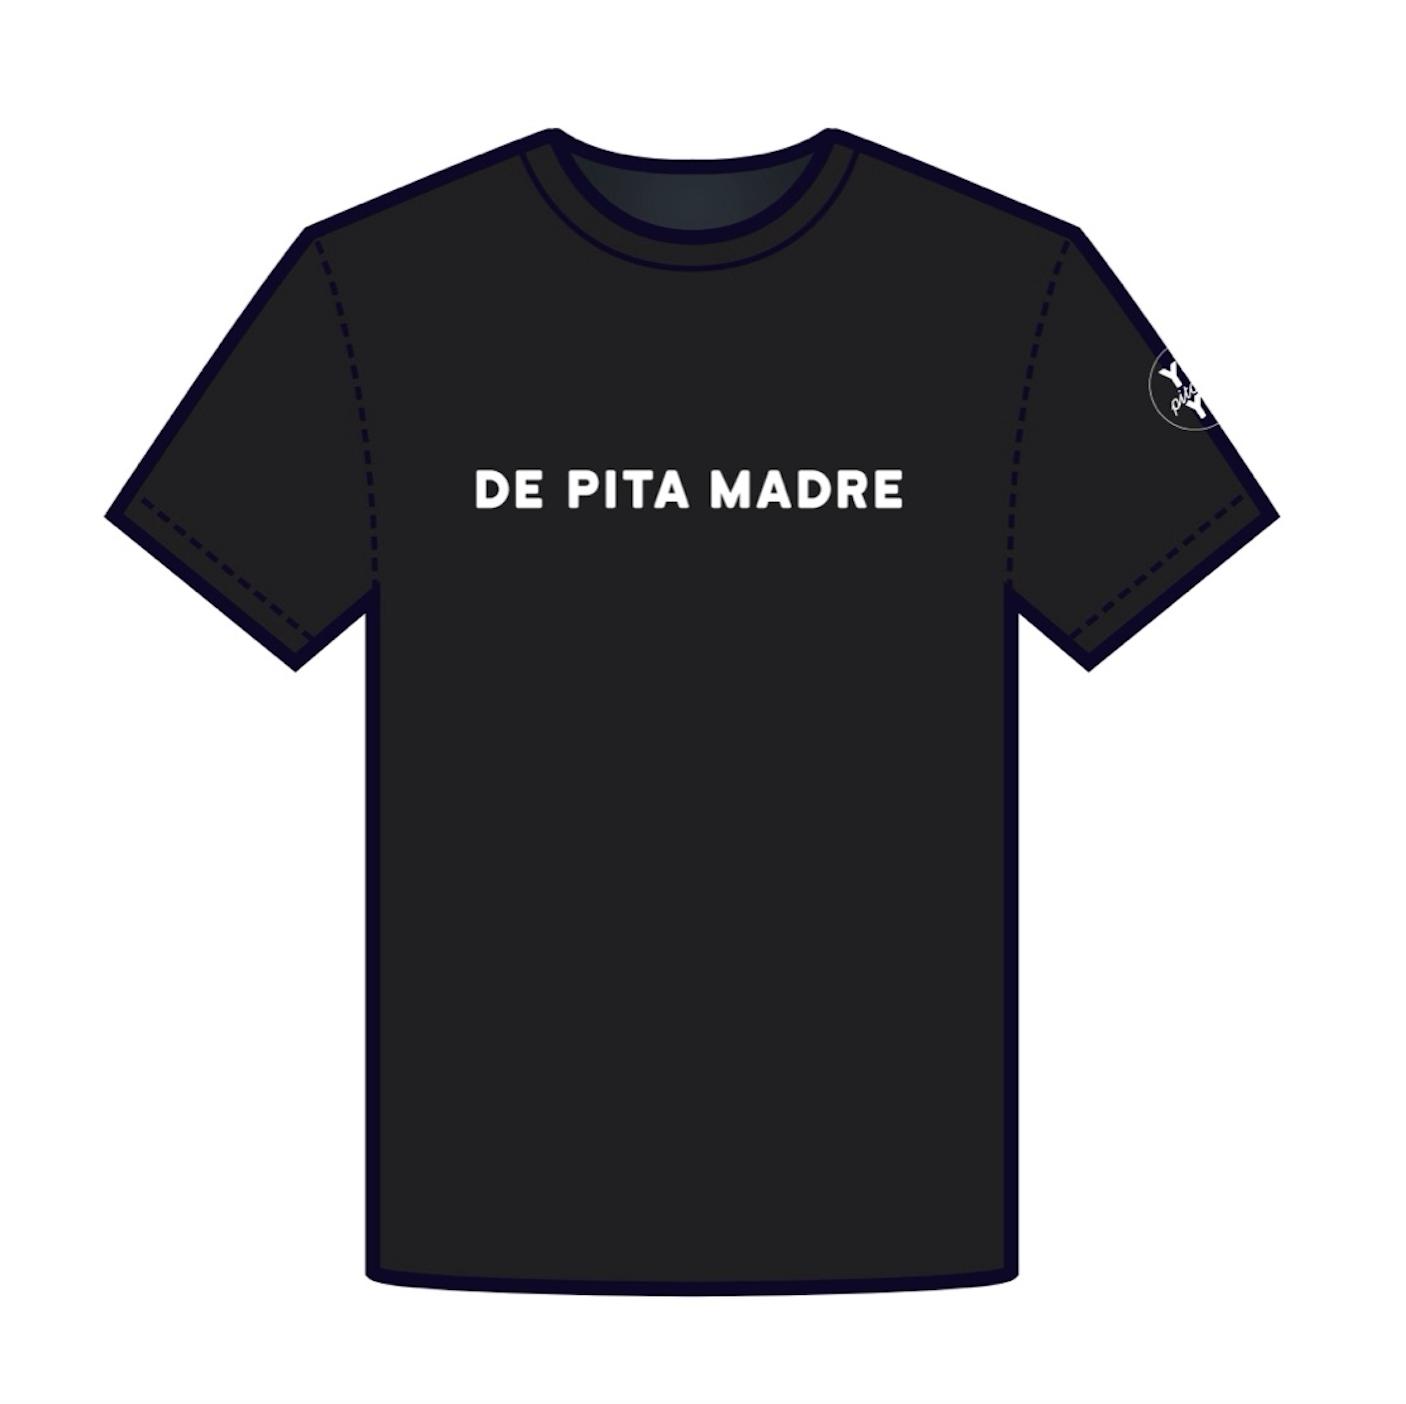 YOYA Shirt De Pita Madre